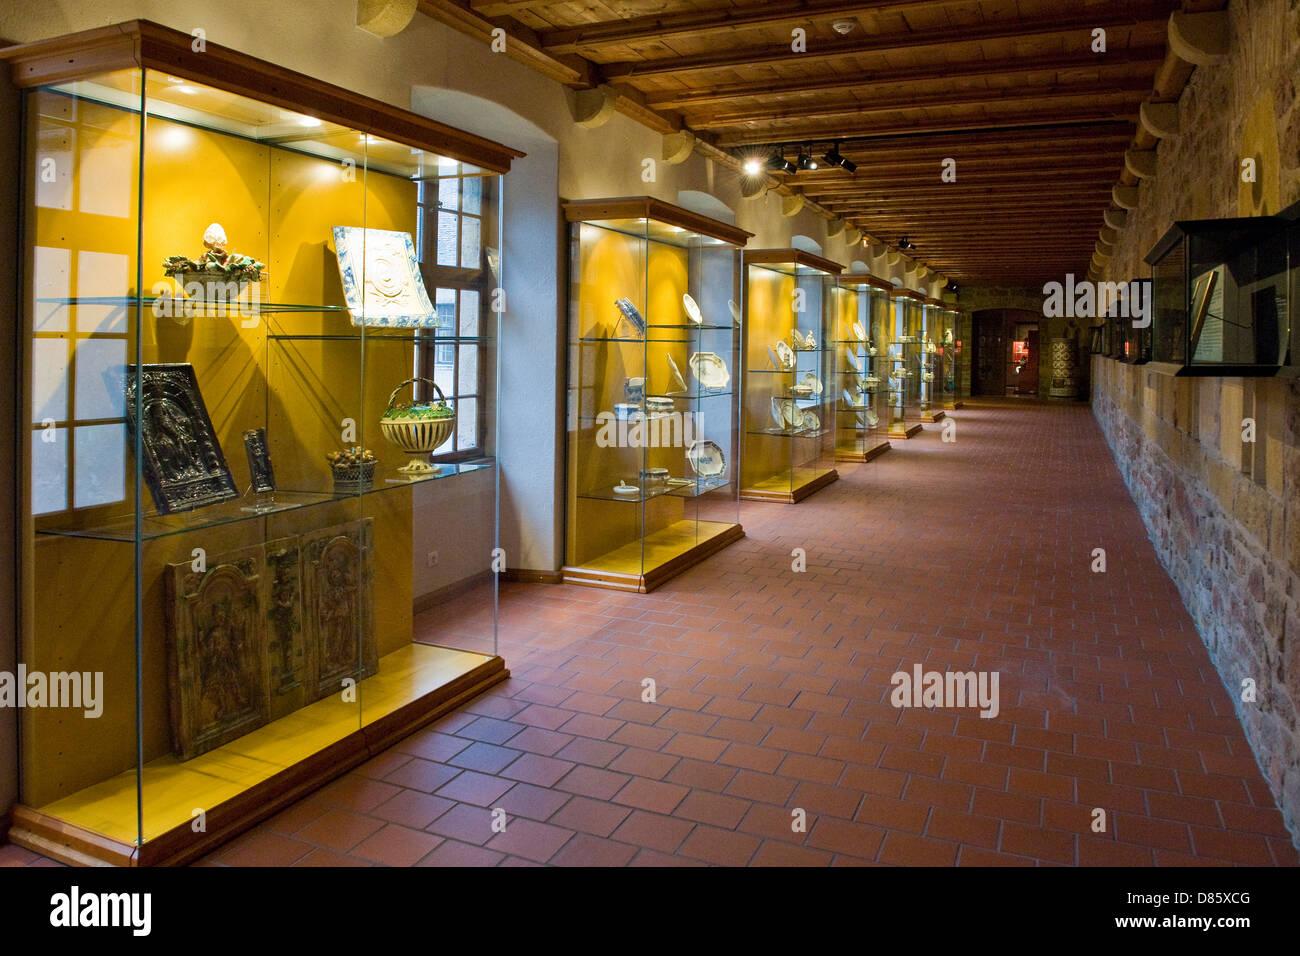 France, Alsace, Colmar, Unterlinden museum - Stock Image